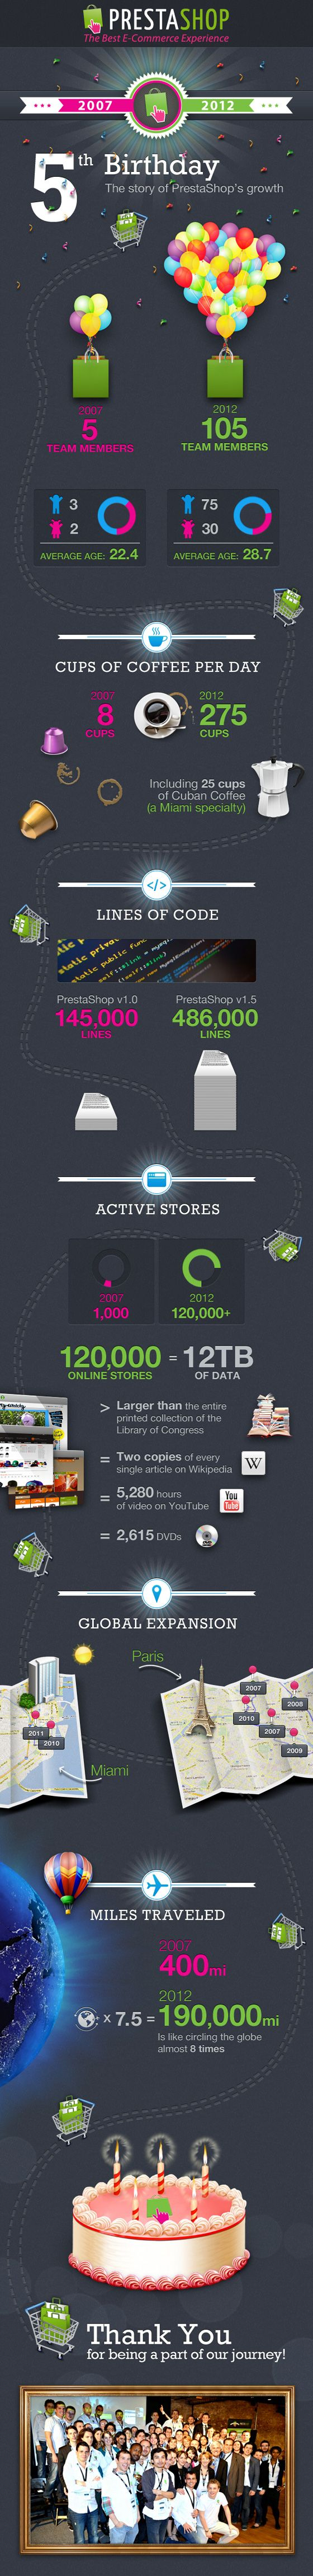 PrestaShop Birthday Infographic